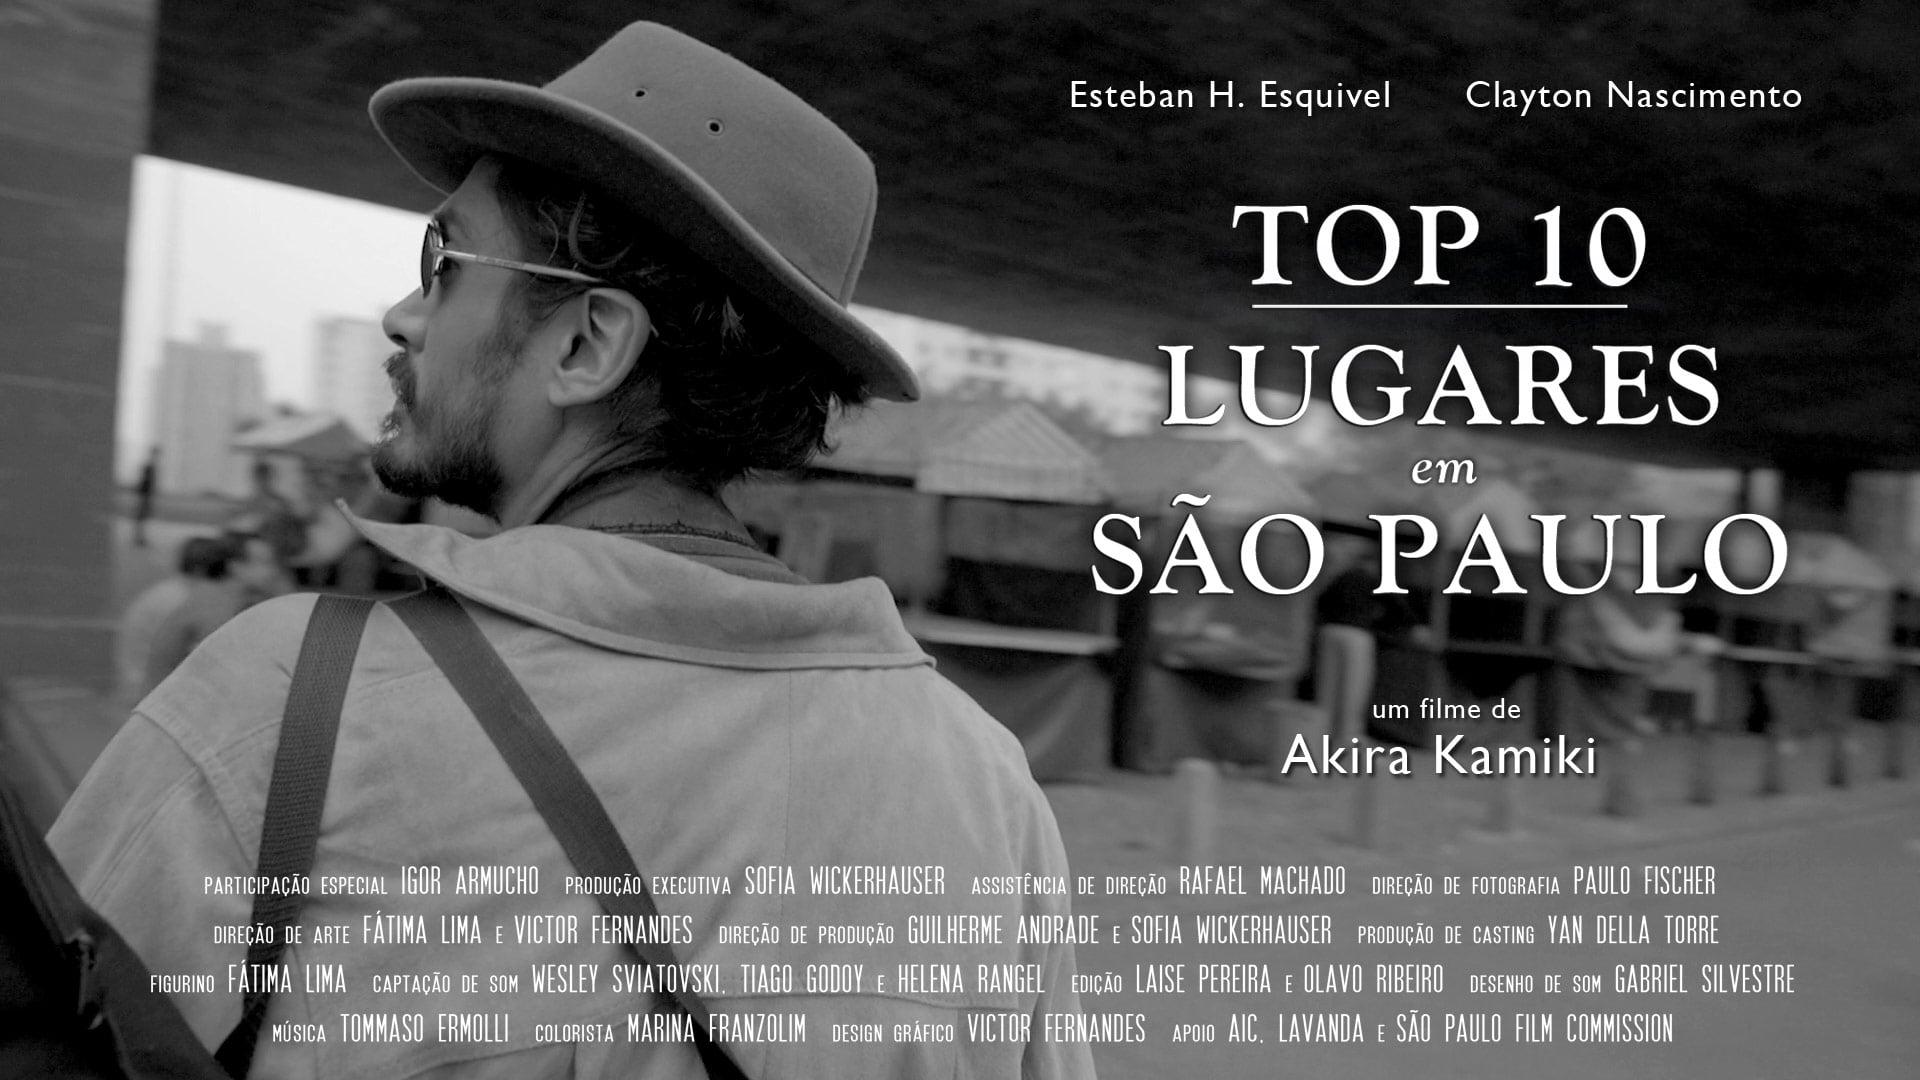 Top 10 Lugares em São Paulo (Top 10 Places to Visit in São Paulo) - Trailer